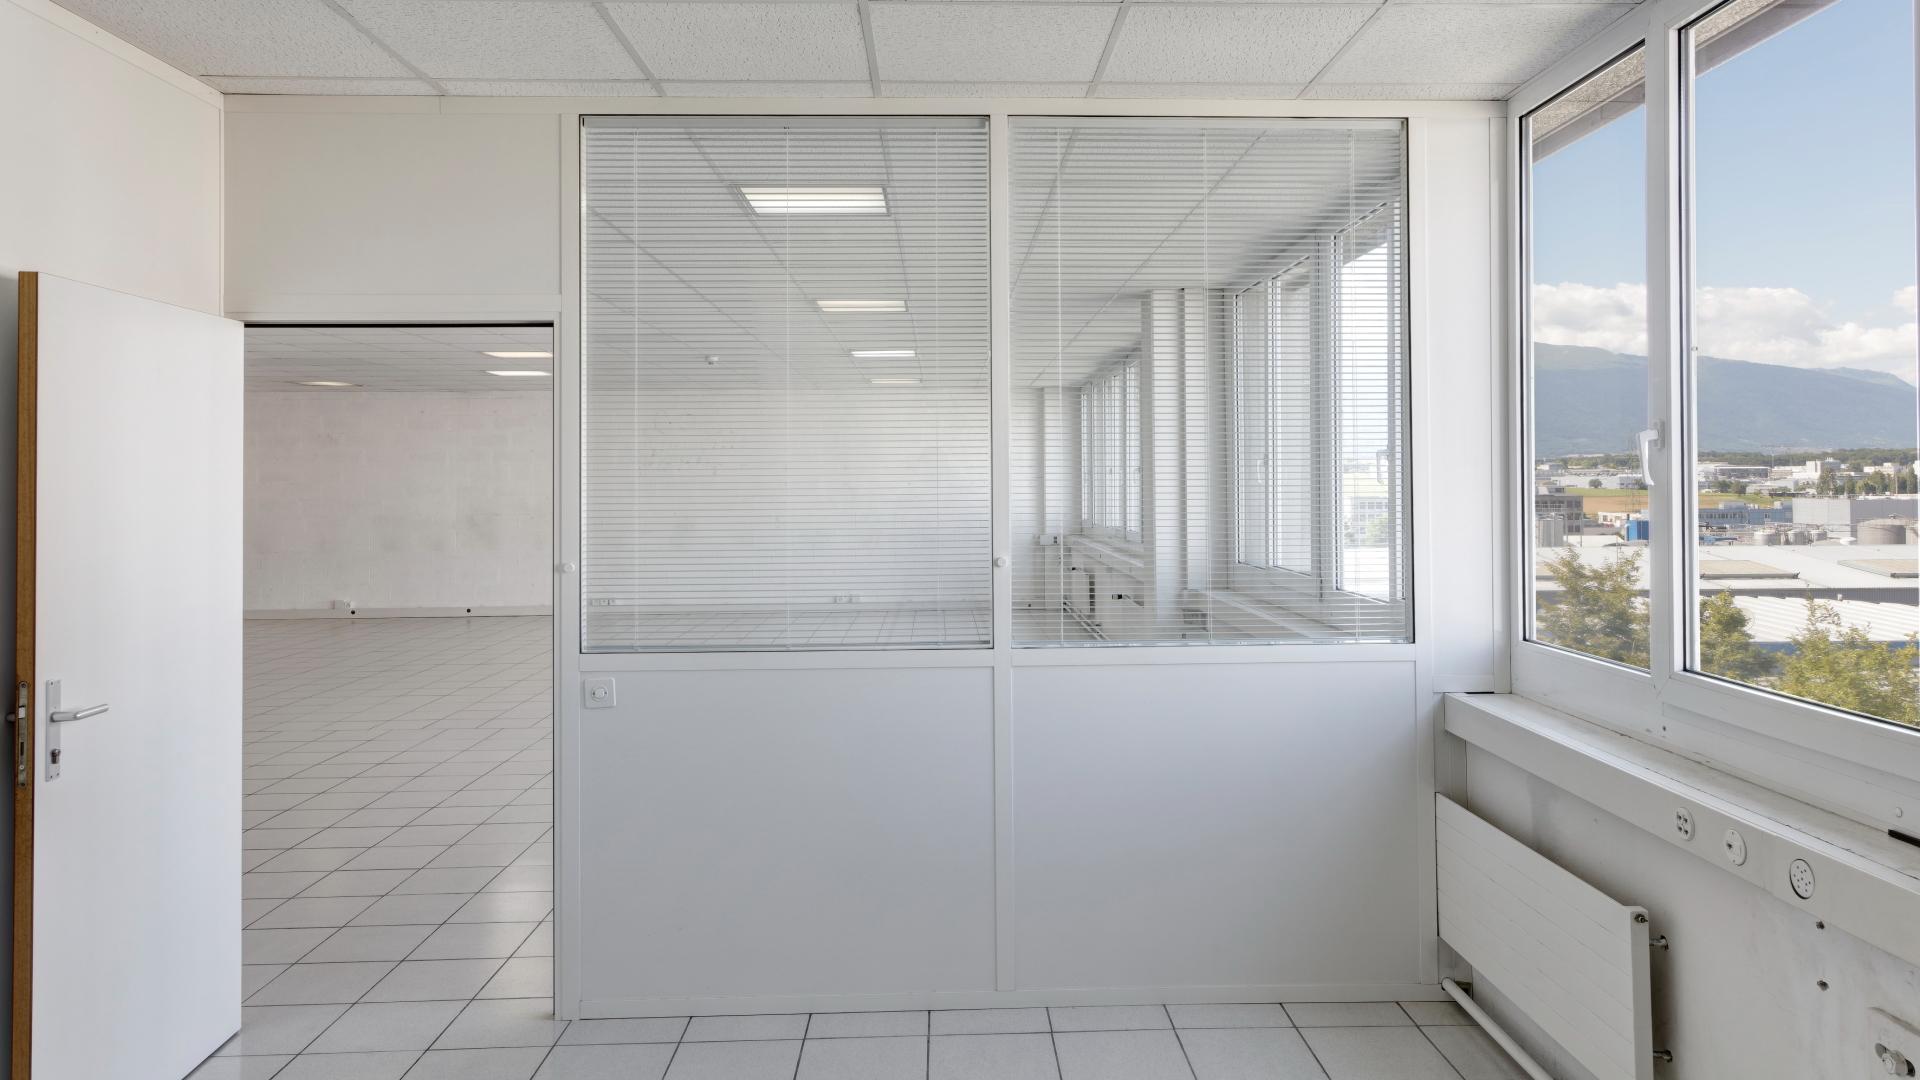 b ro gewerberaum 208 m2 3 stock zimeysa satigny. Black Bedroom Furniture Sets. Home Design Ideas